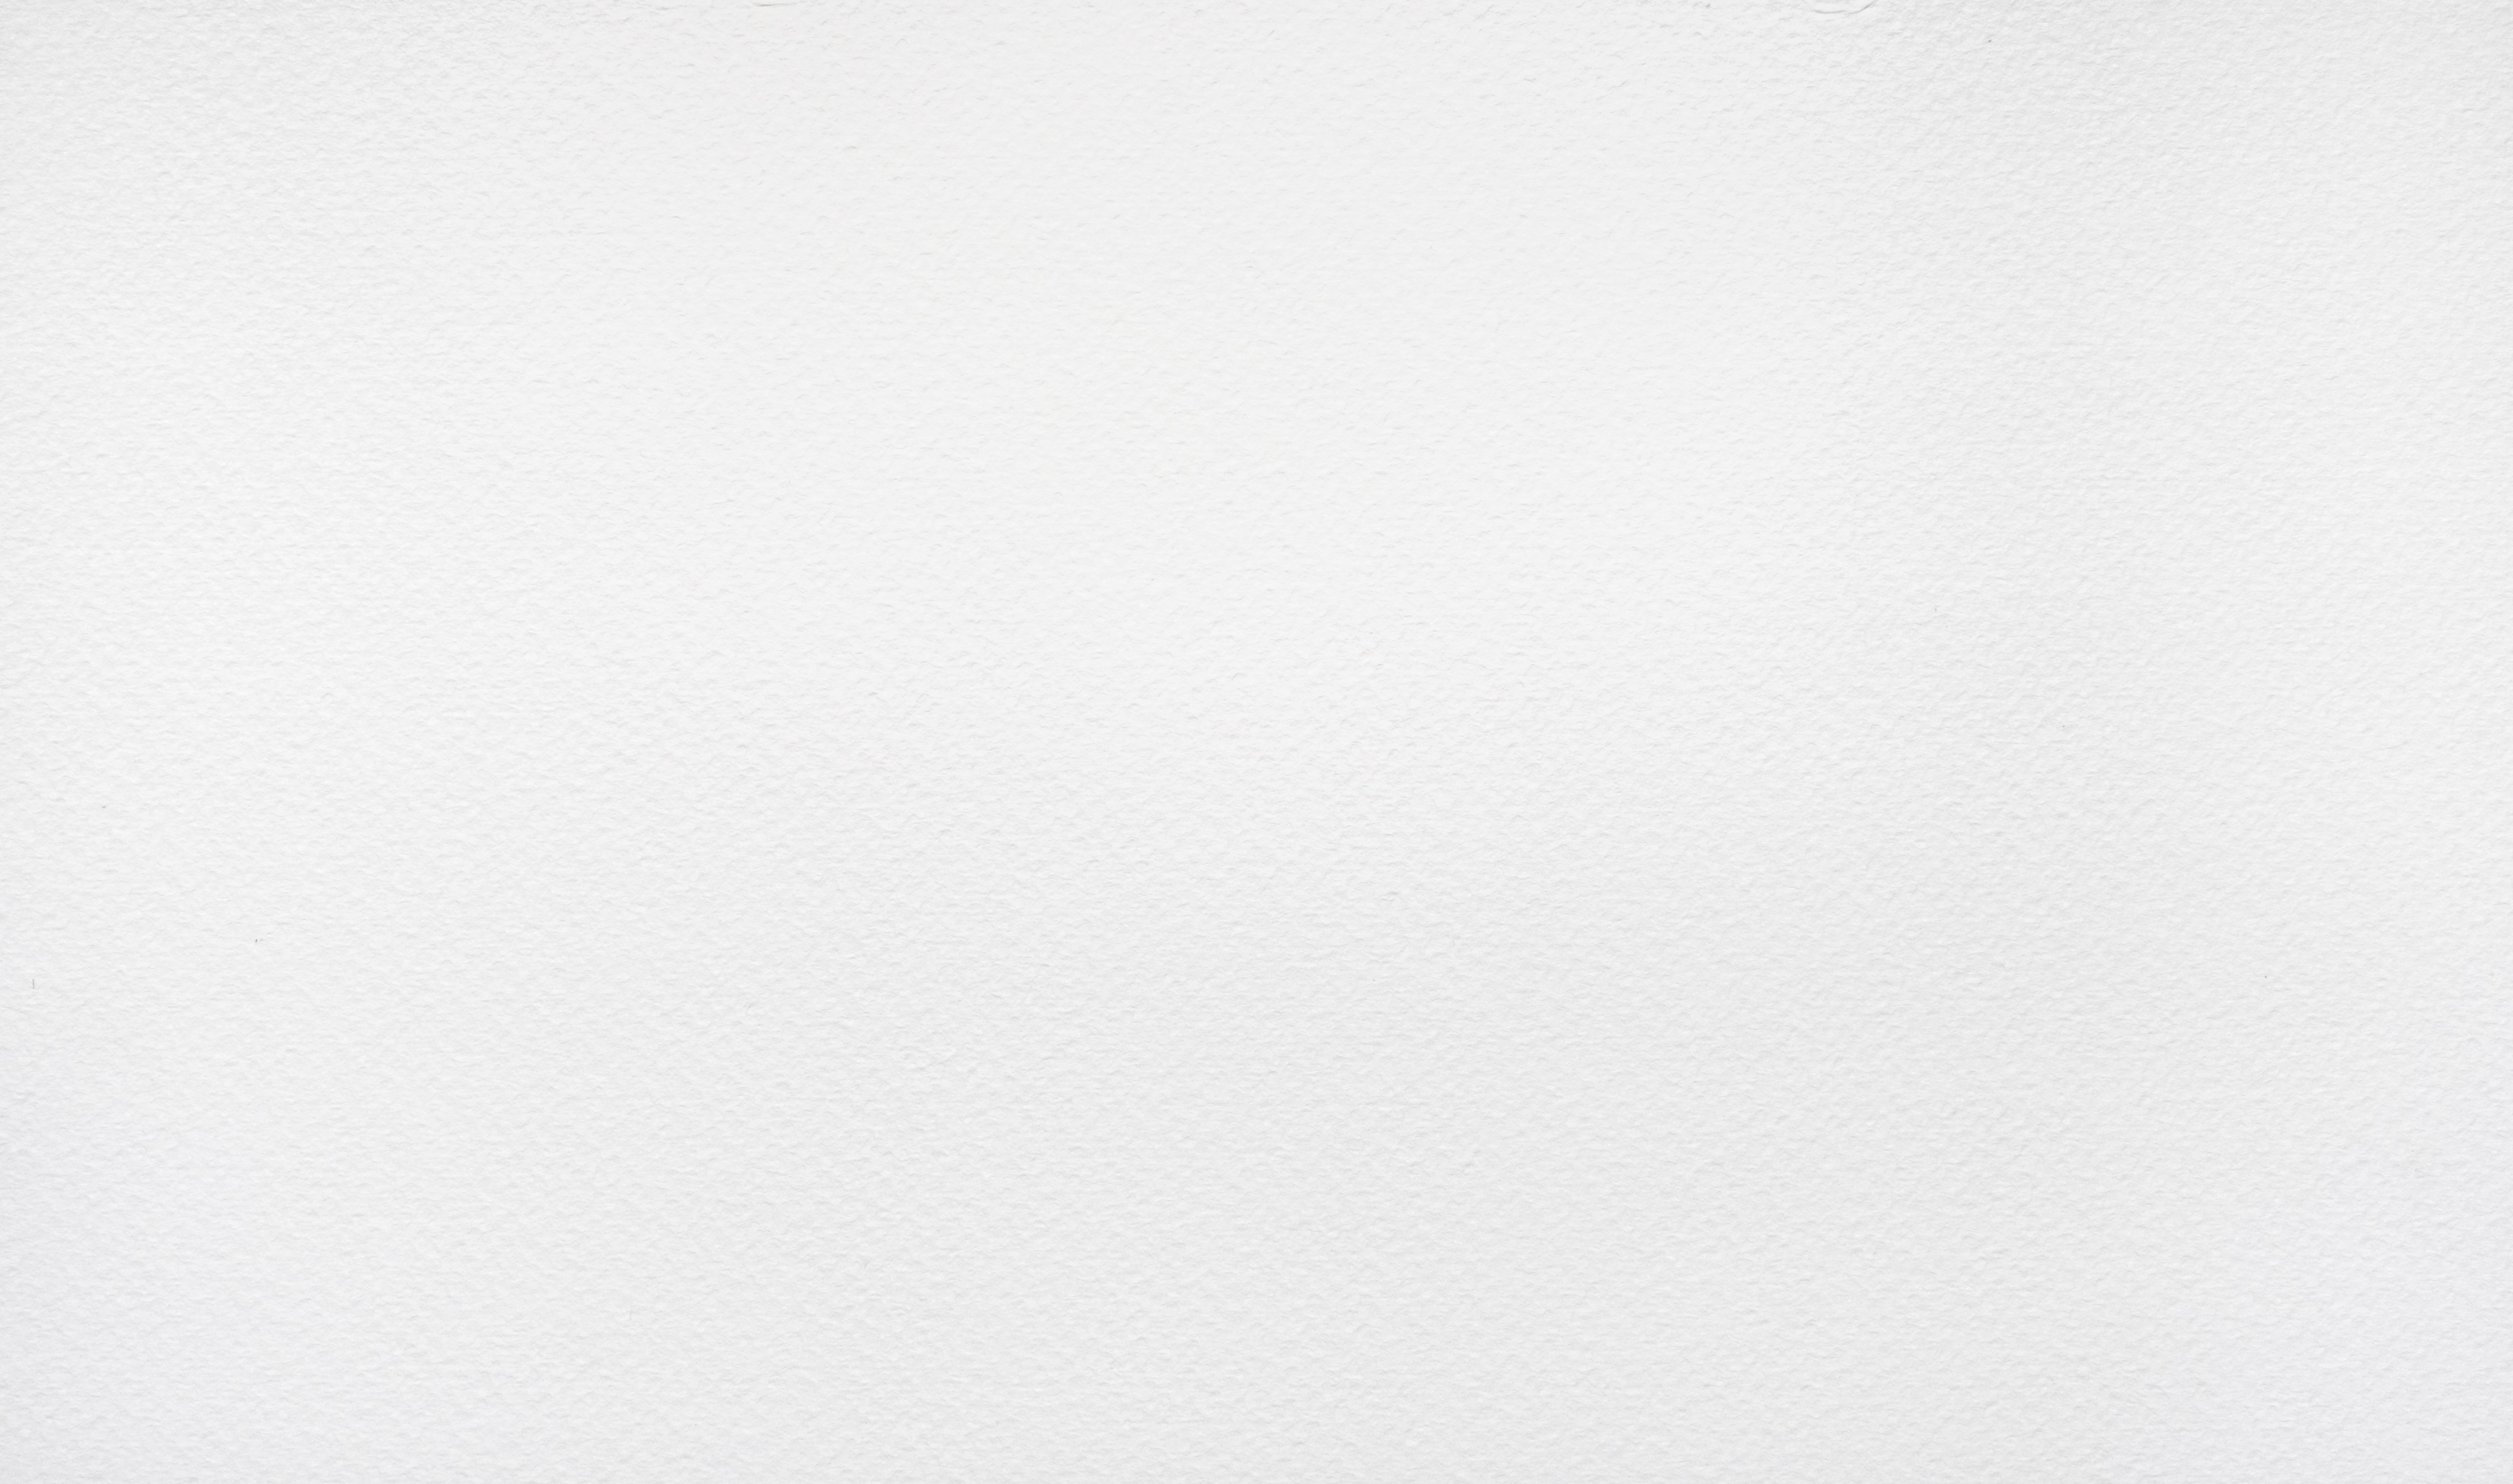 white paper texture background - Baldwin Design ...